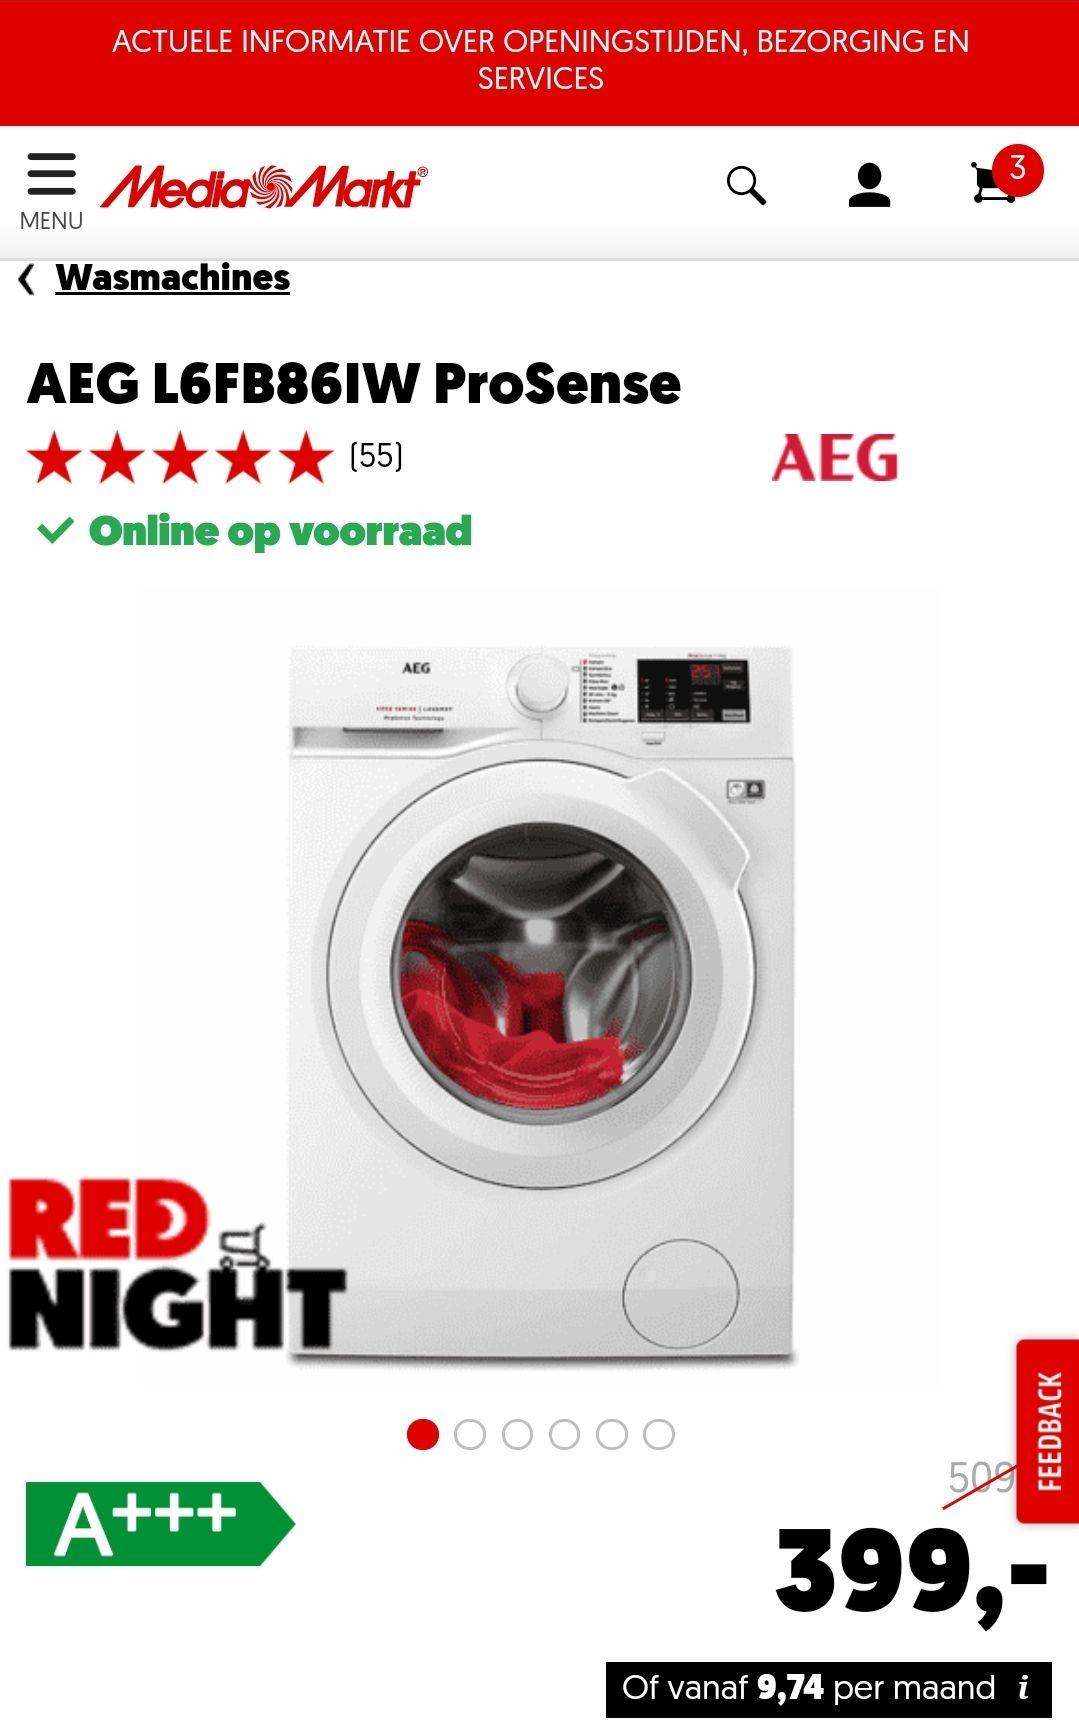 AEG L6FB86IW ProSense A+++ Wasmachine €399 @ Mediamarkt